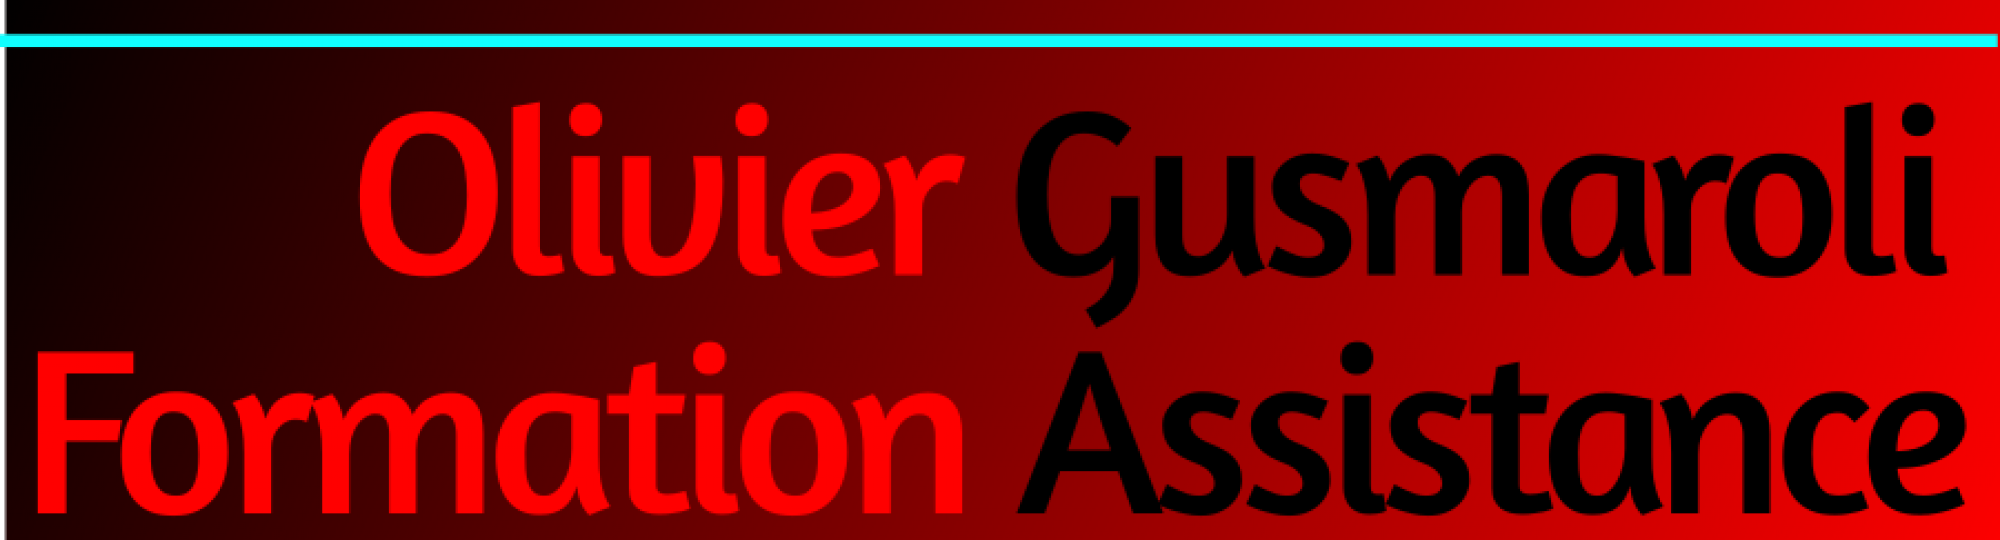 Olivier Gusmaroli Formation Assistance